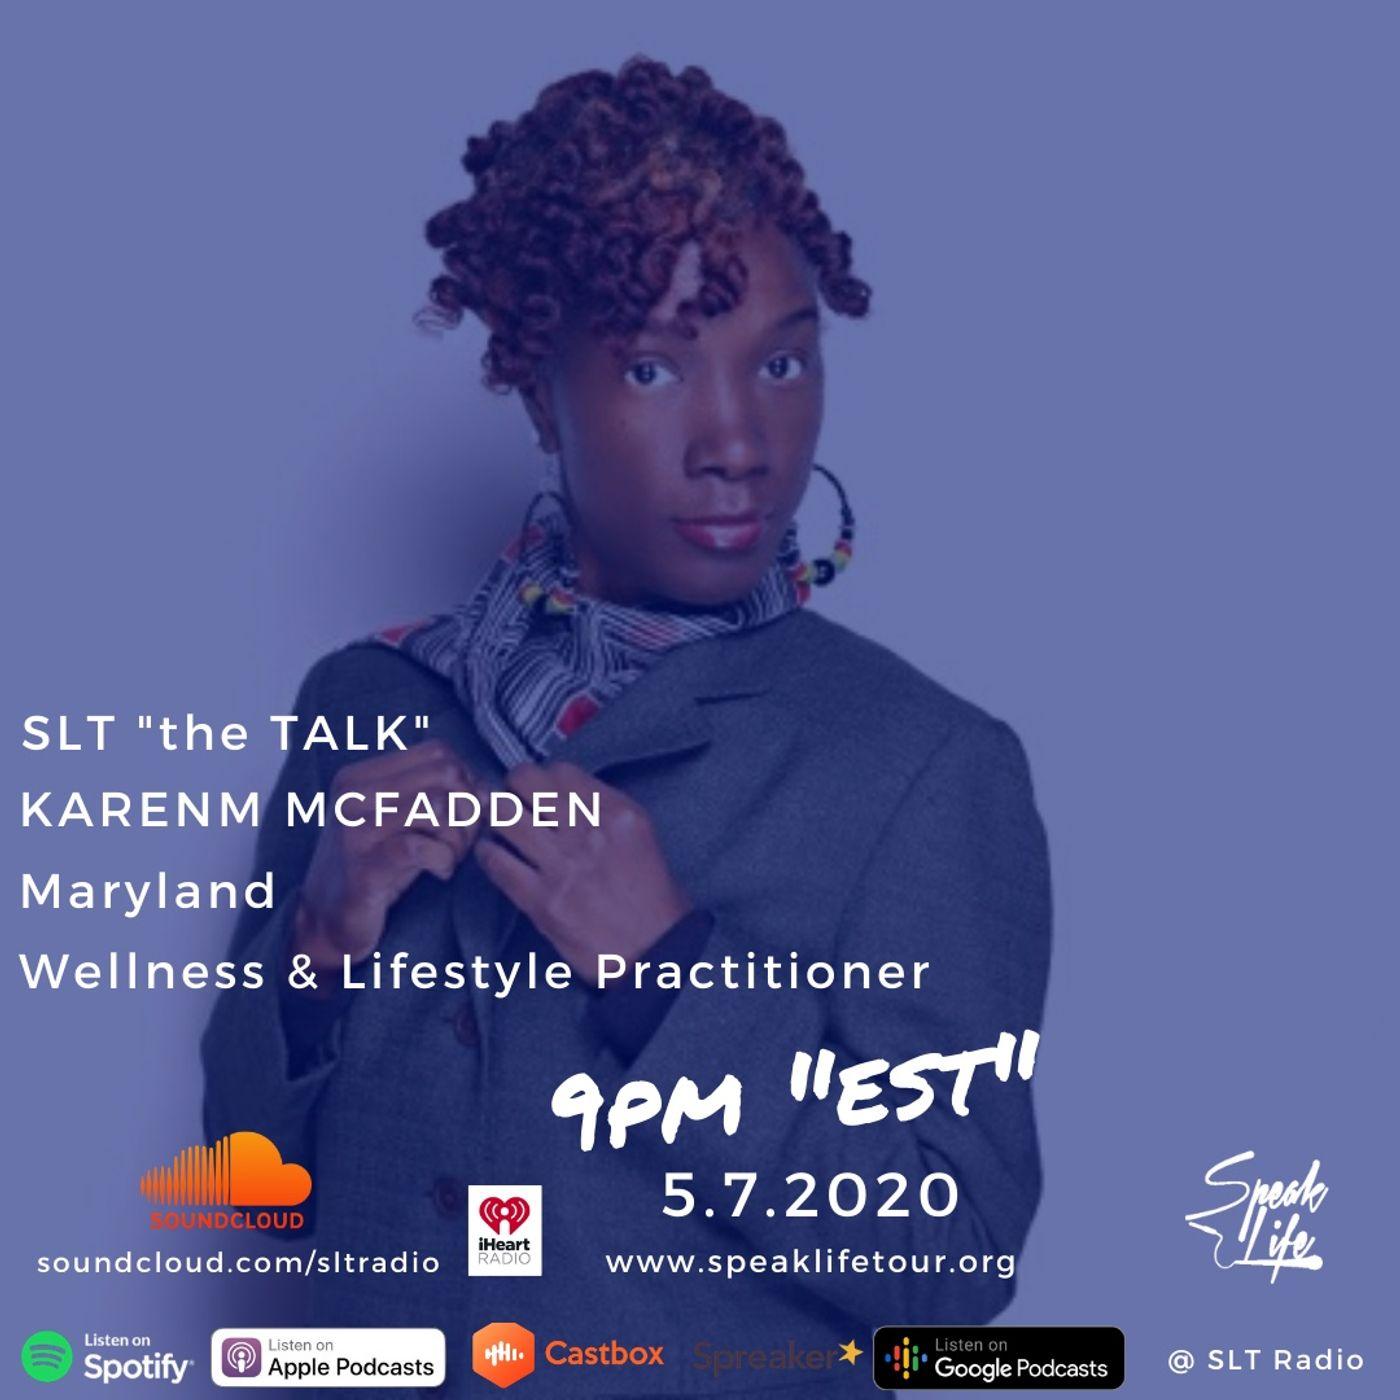 "5.7 - SLT ""the TALK"" featuring Karenm McFadden, Wellness & Lifestyle Practitioner"